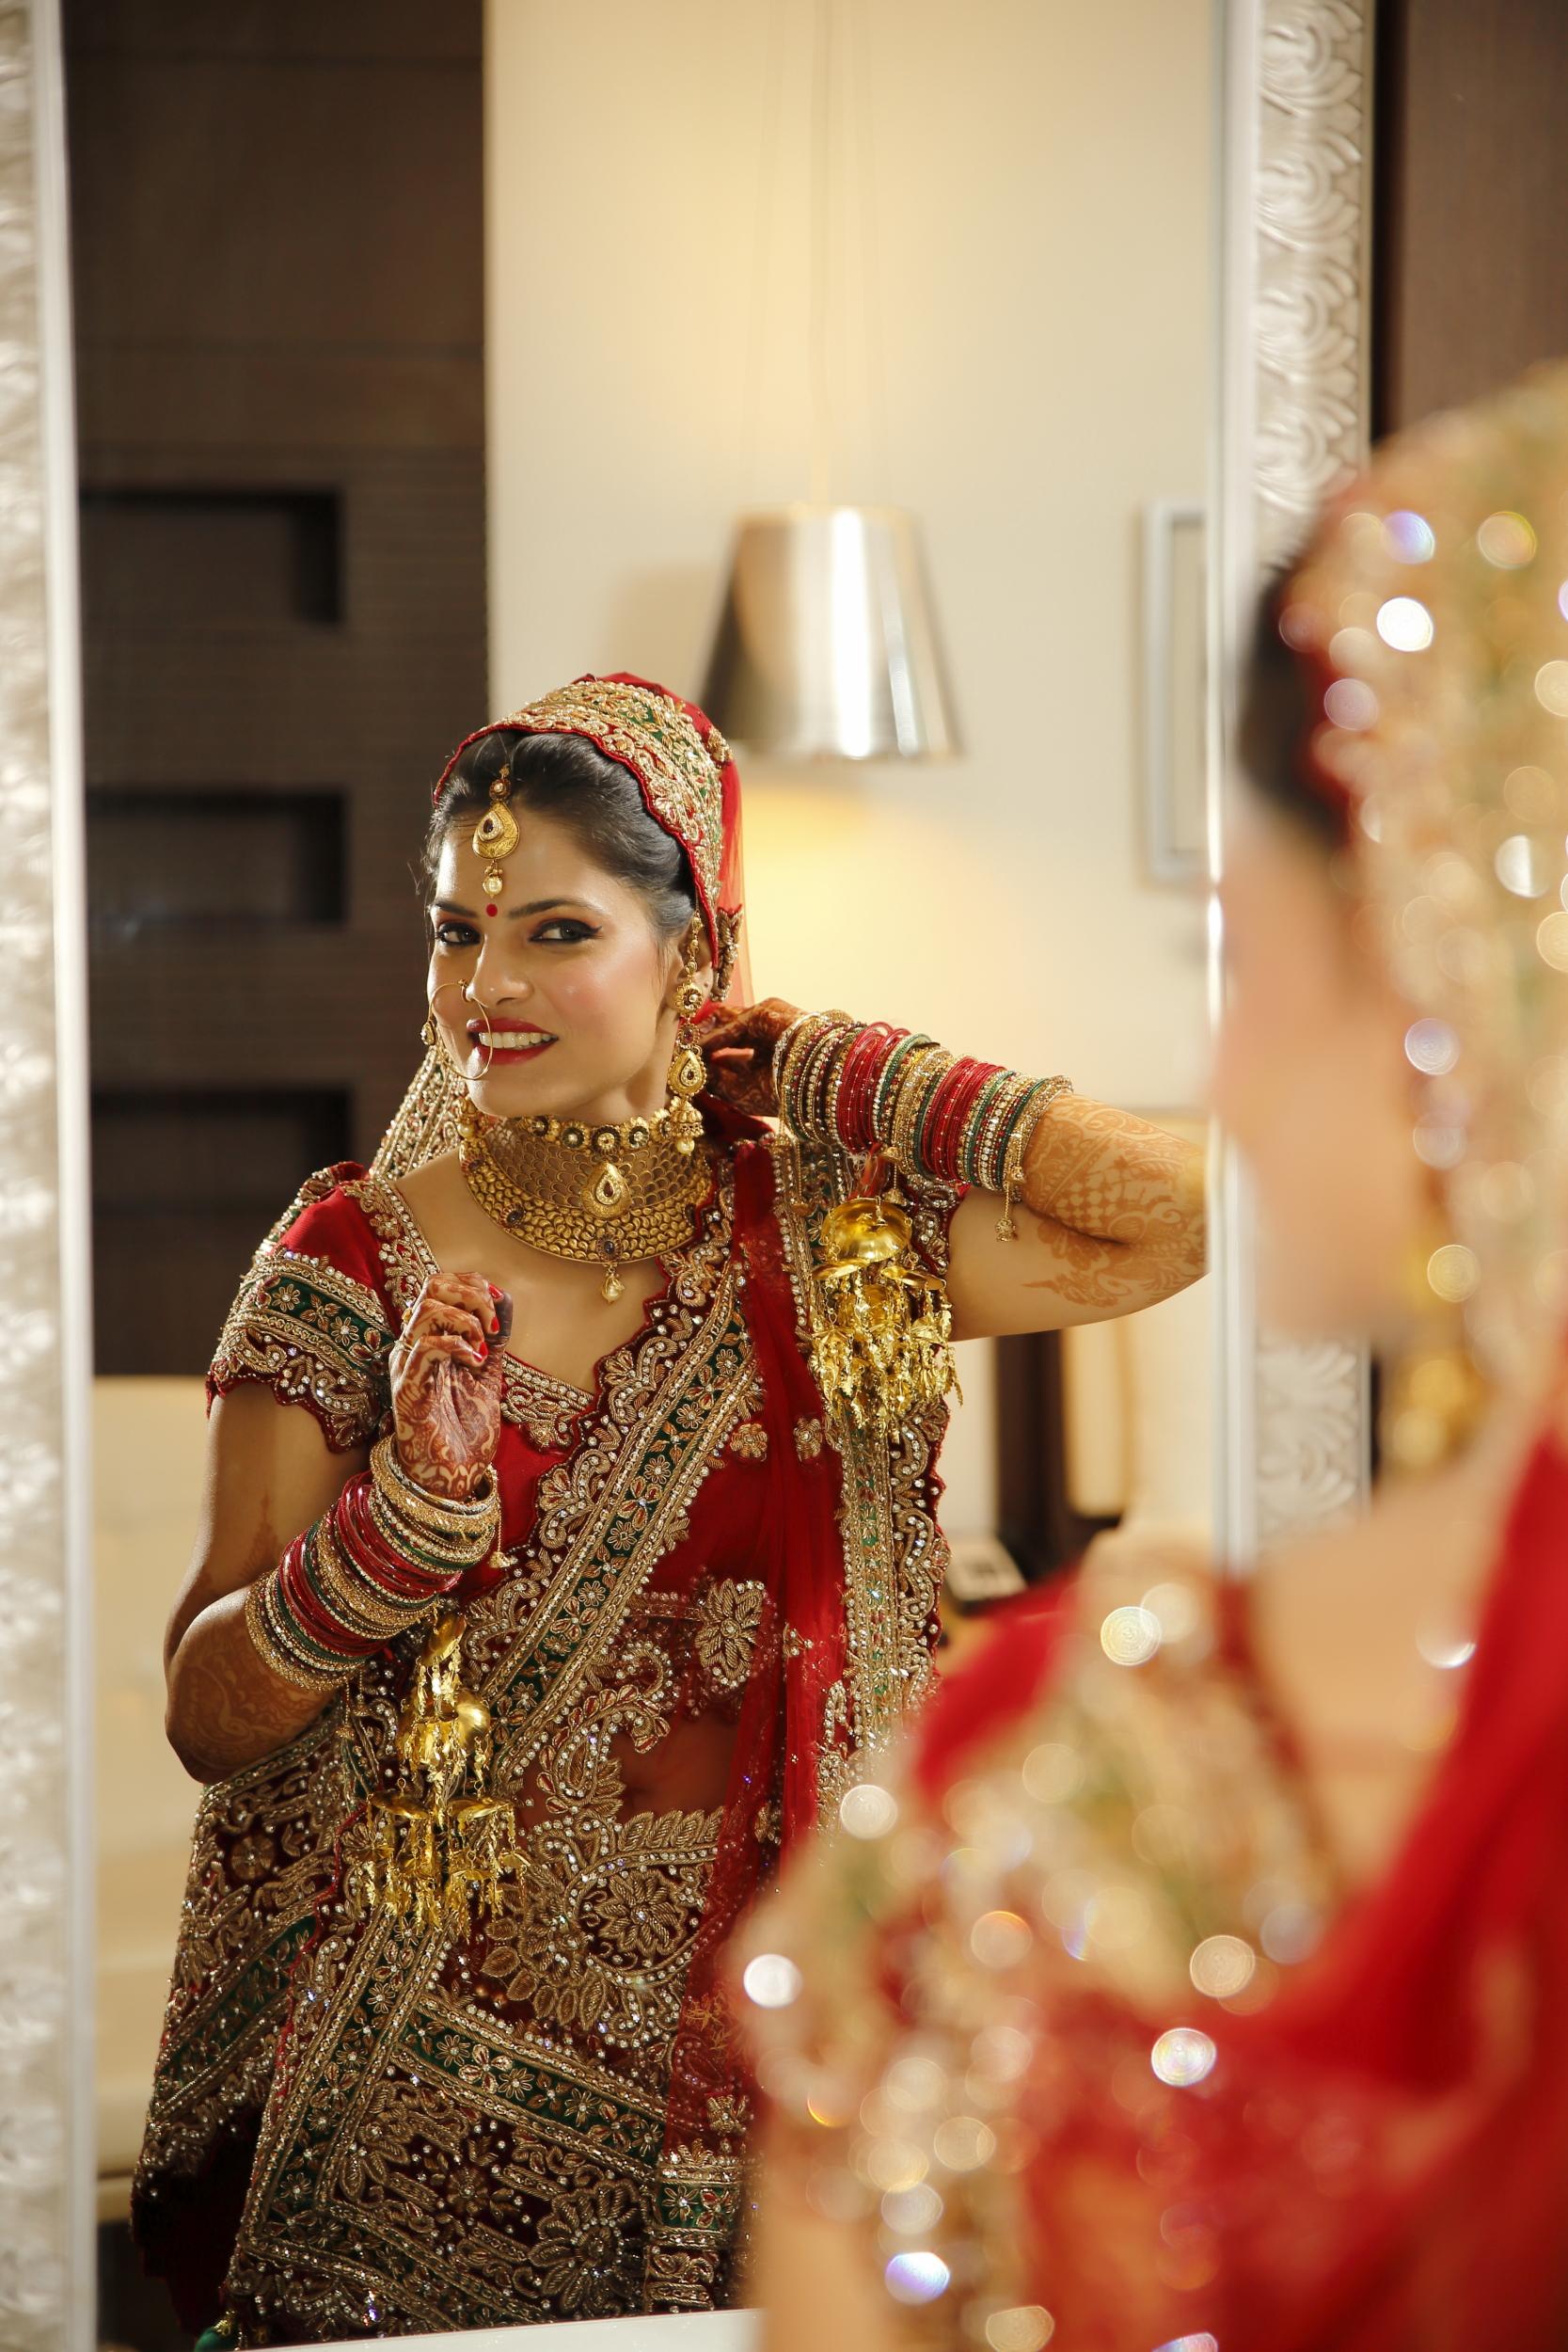 Best candid wedding -25 TWR Photographer Delhi NCR